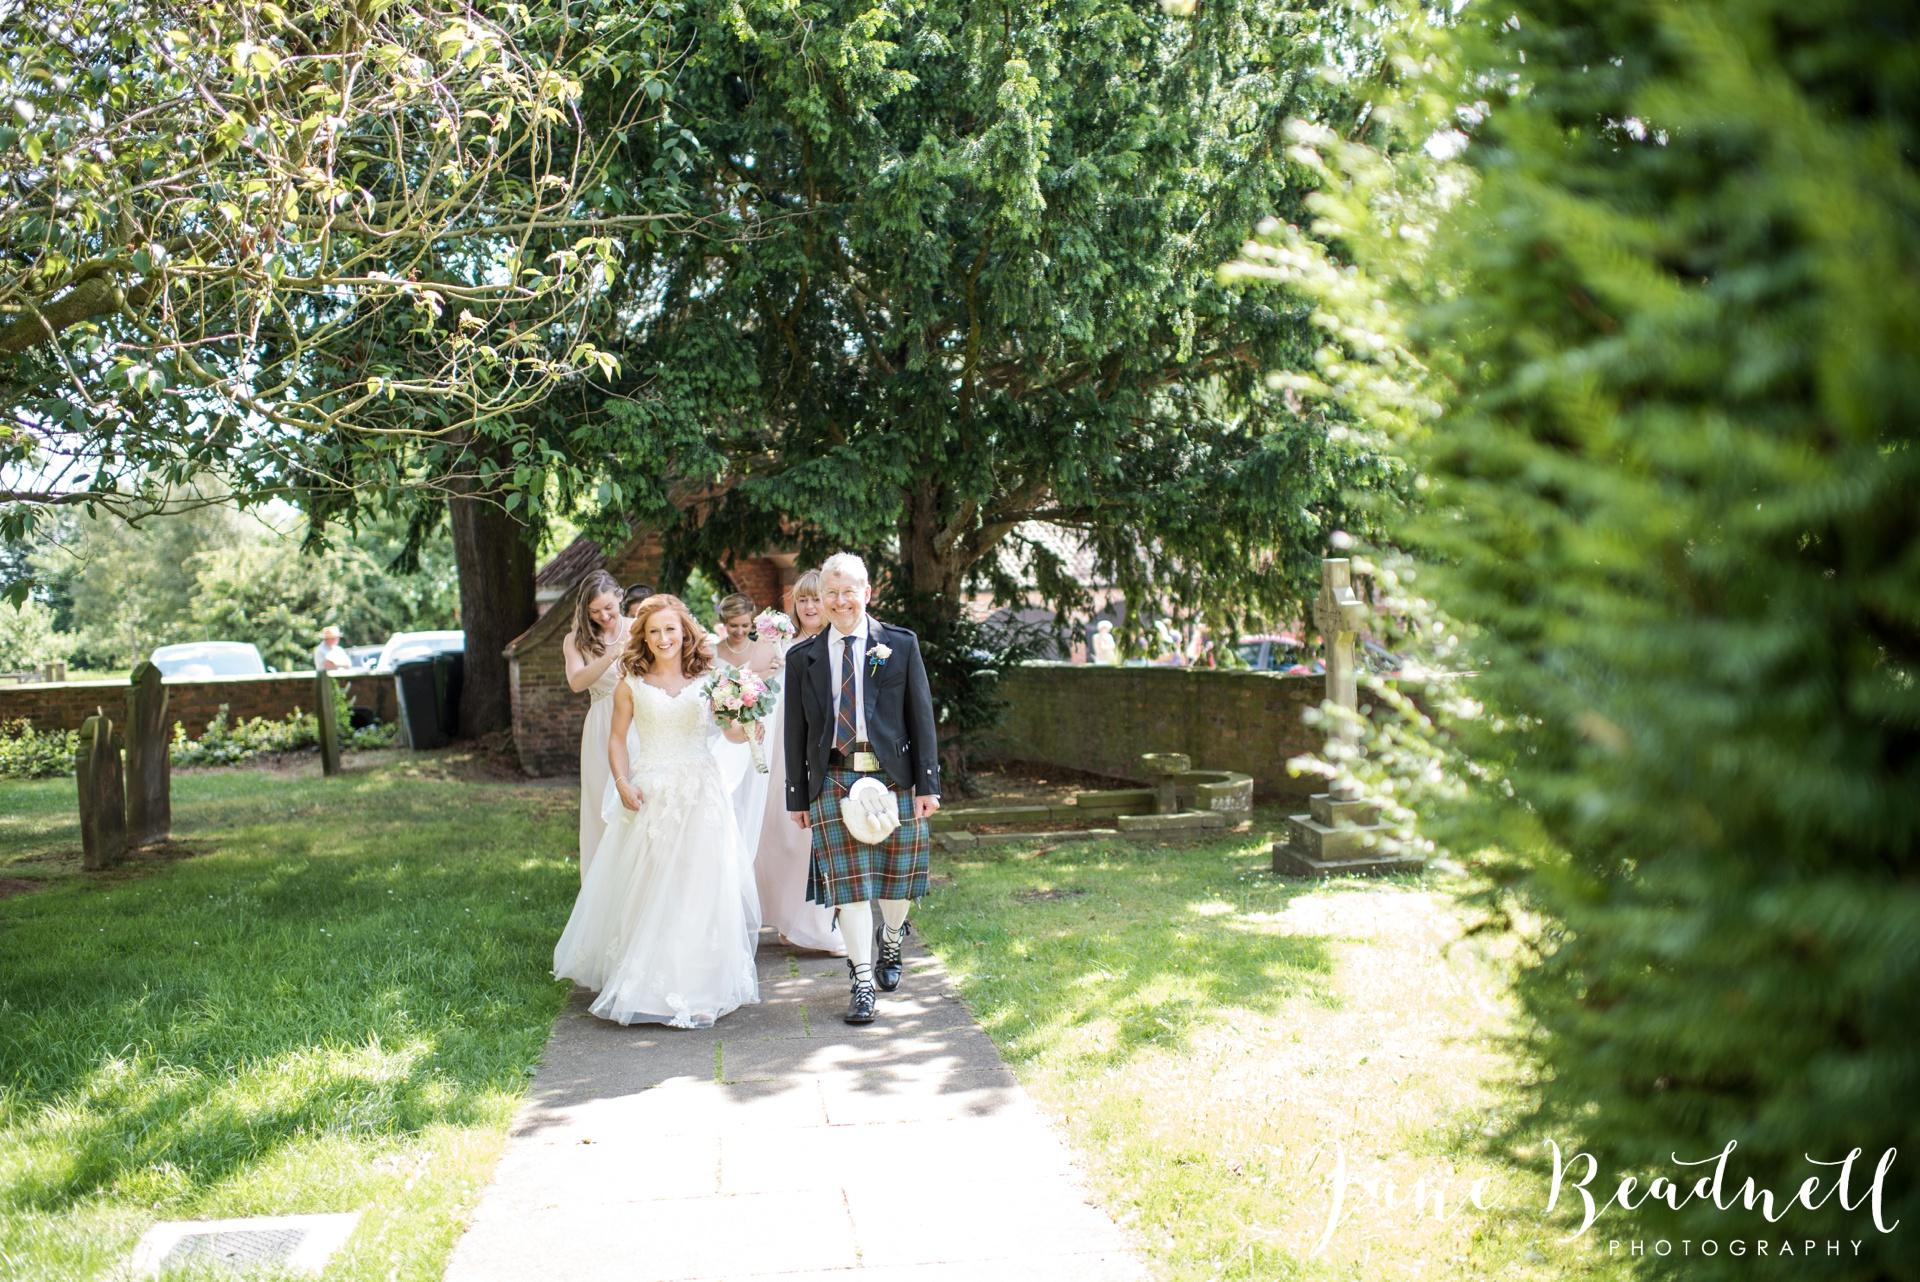 yorkshire-fine-art-wedding-photographer-jane-beadnell-photography-poppleton-york_0037